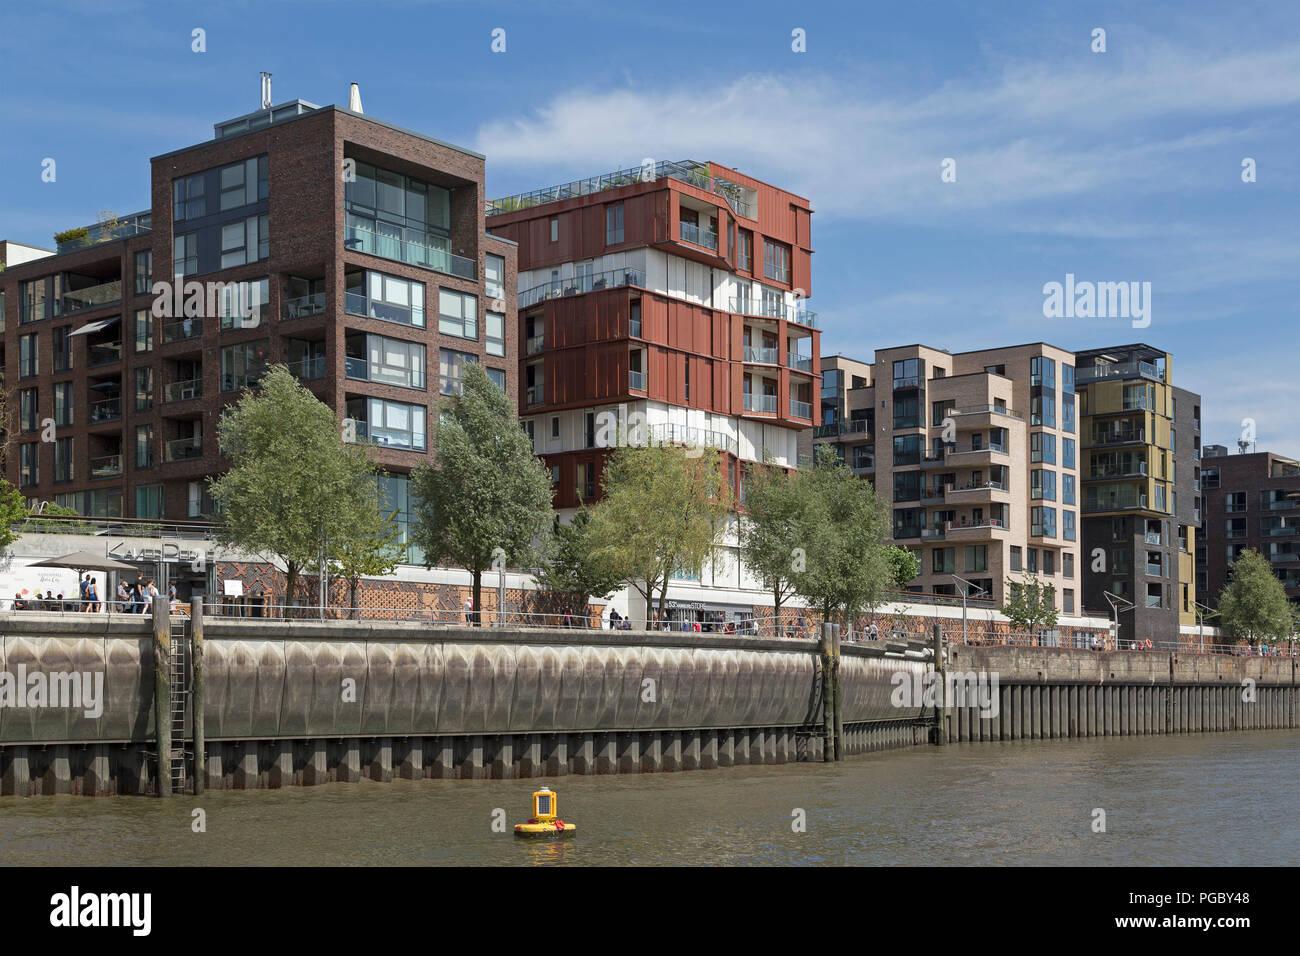 Dalmannkai, HafenCity (Harbour City), Hamburg, Germany - Stock Image